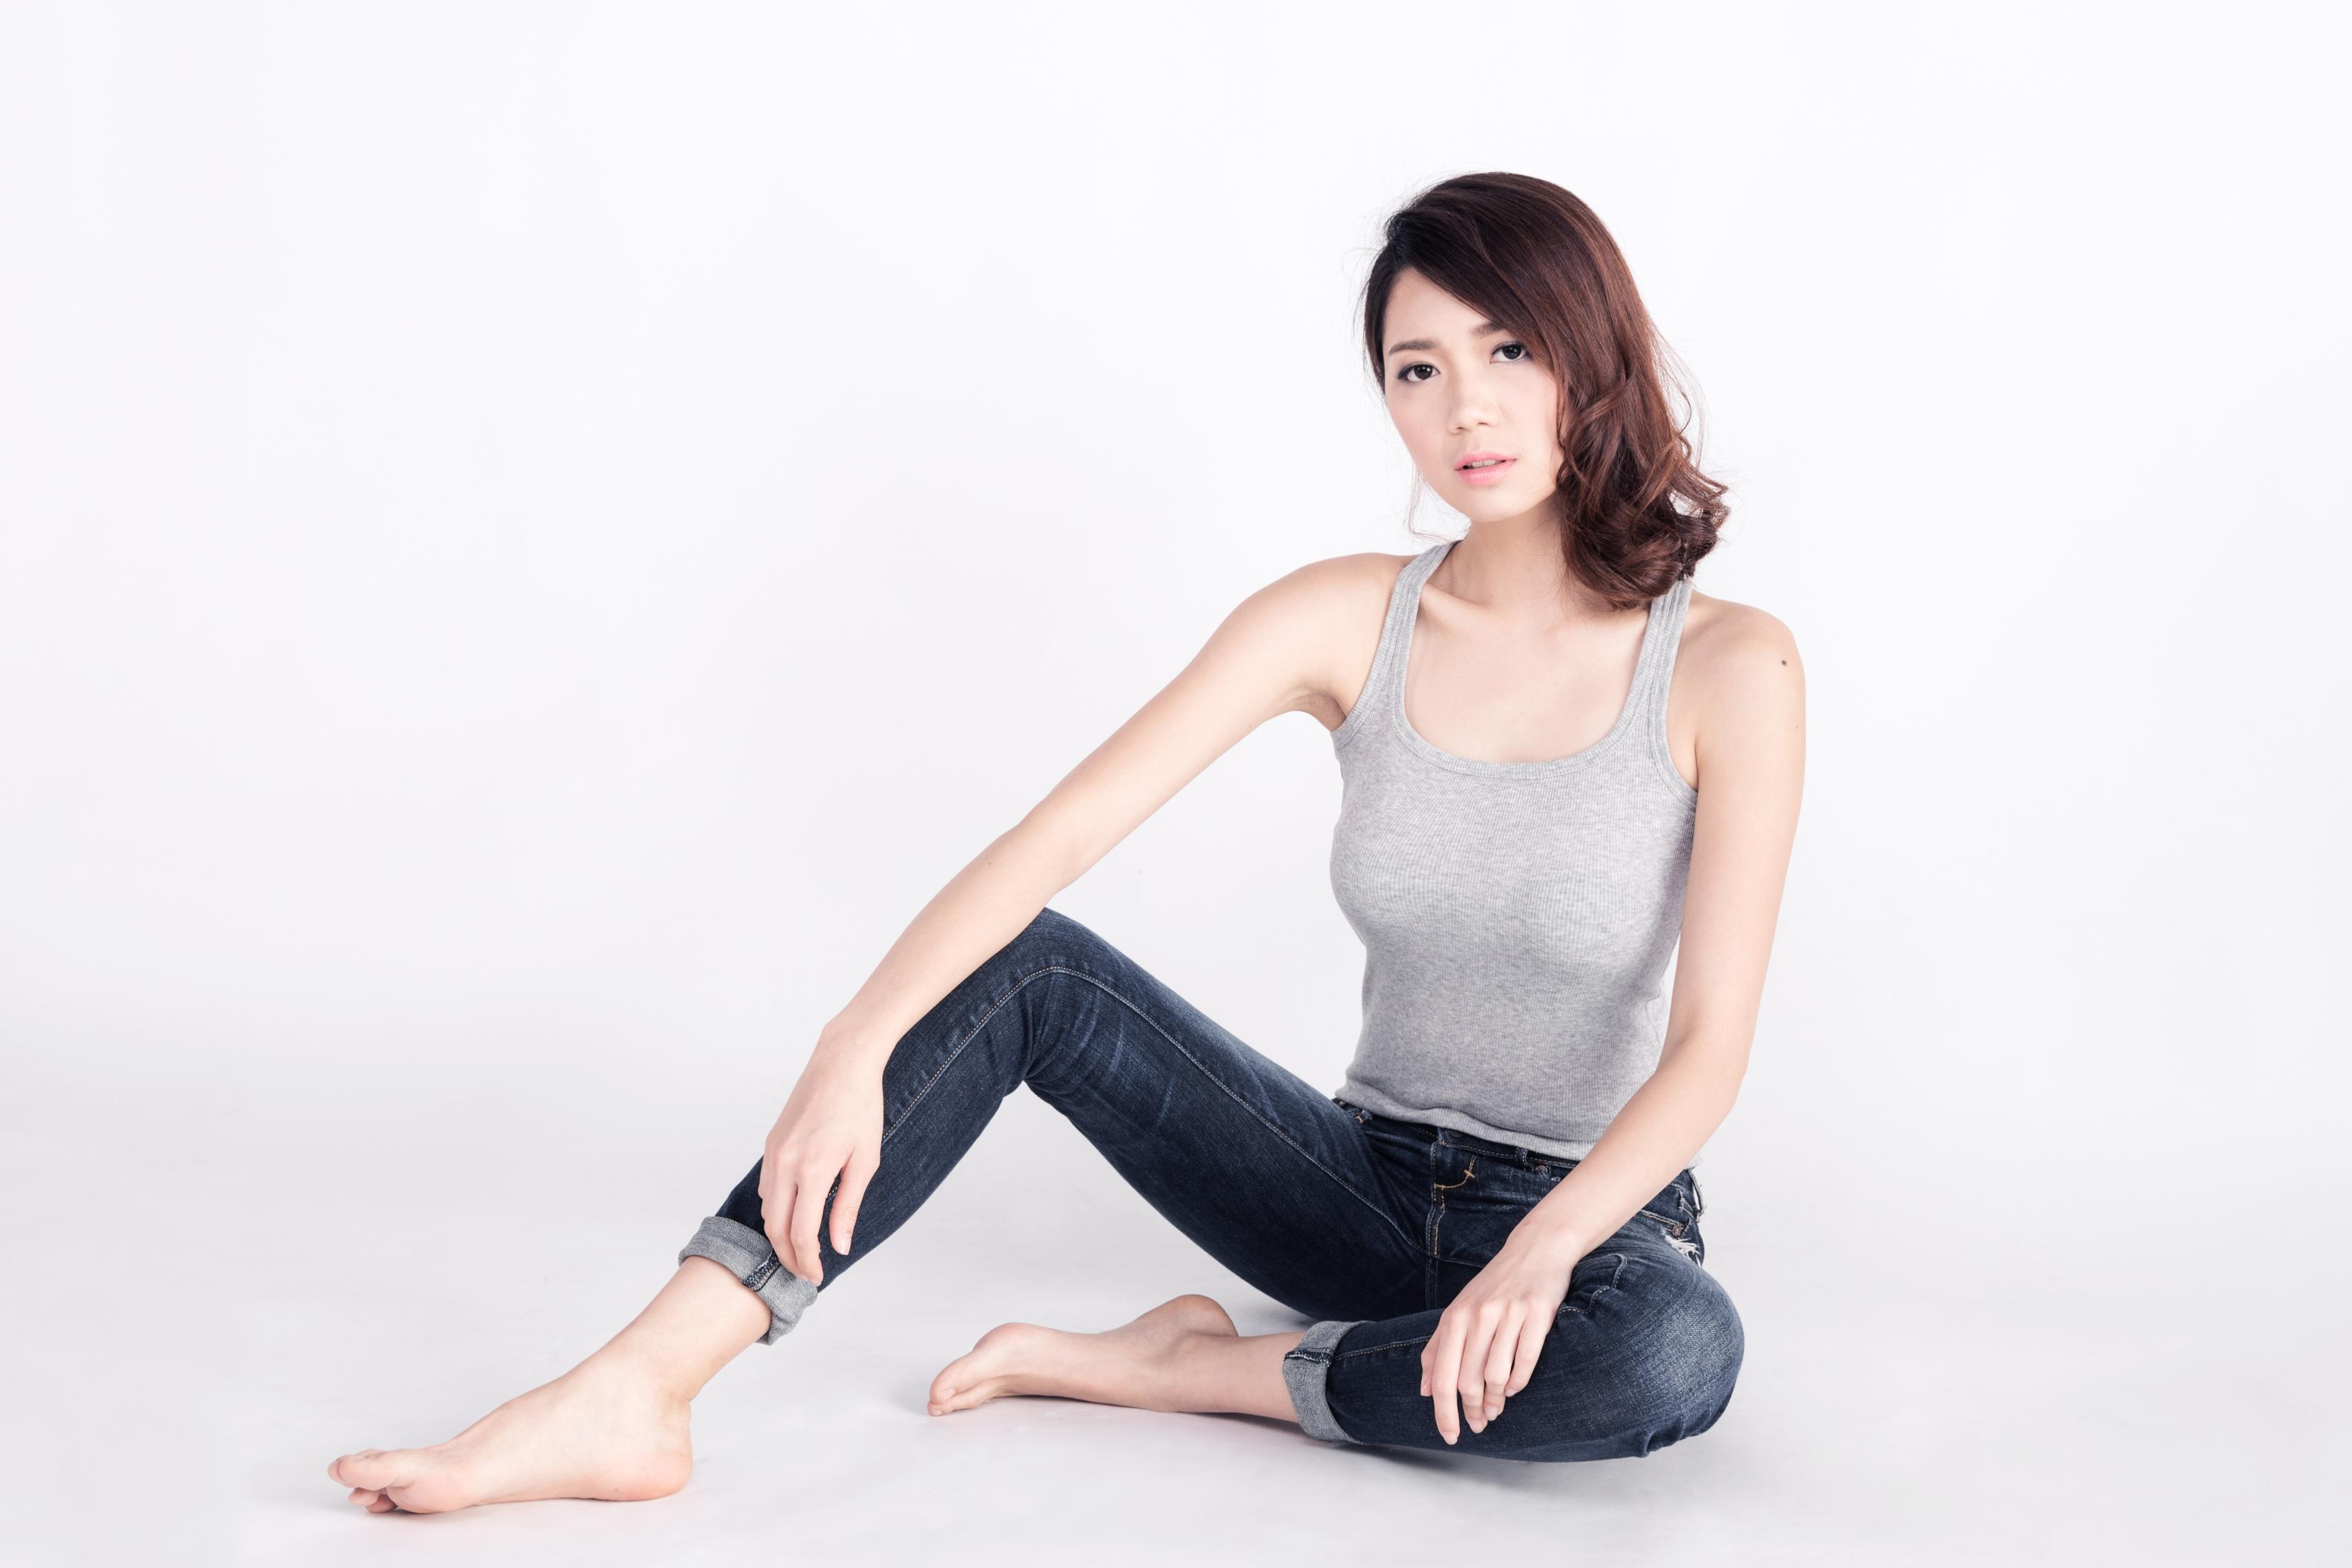 Model Factory Hong Kong Female Model RachelC